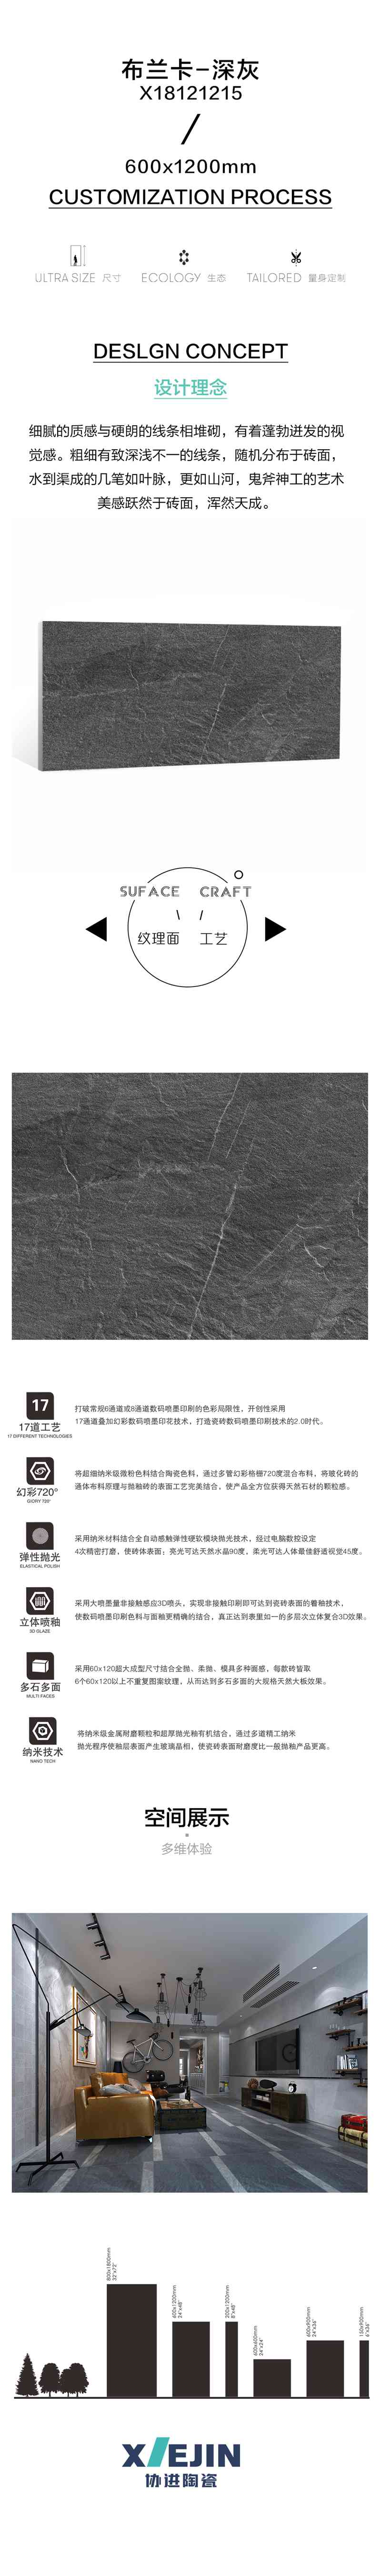 X18121215--02.jpg